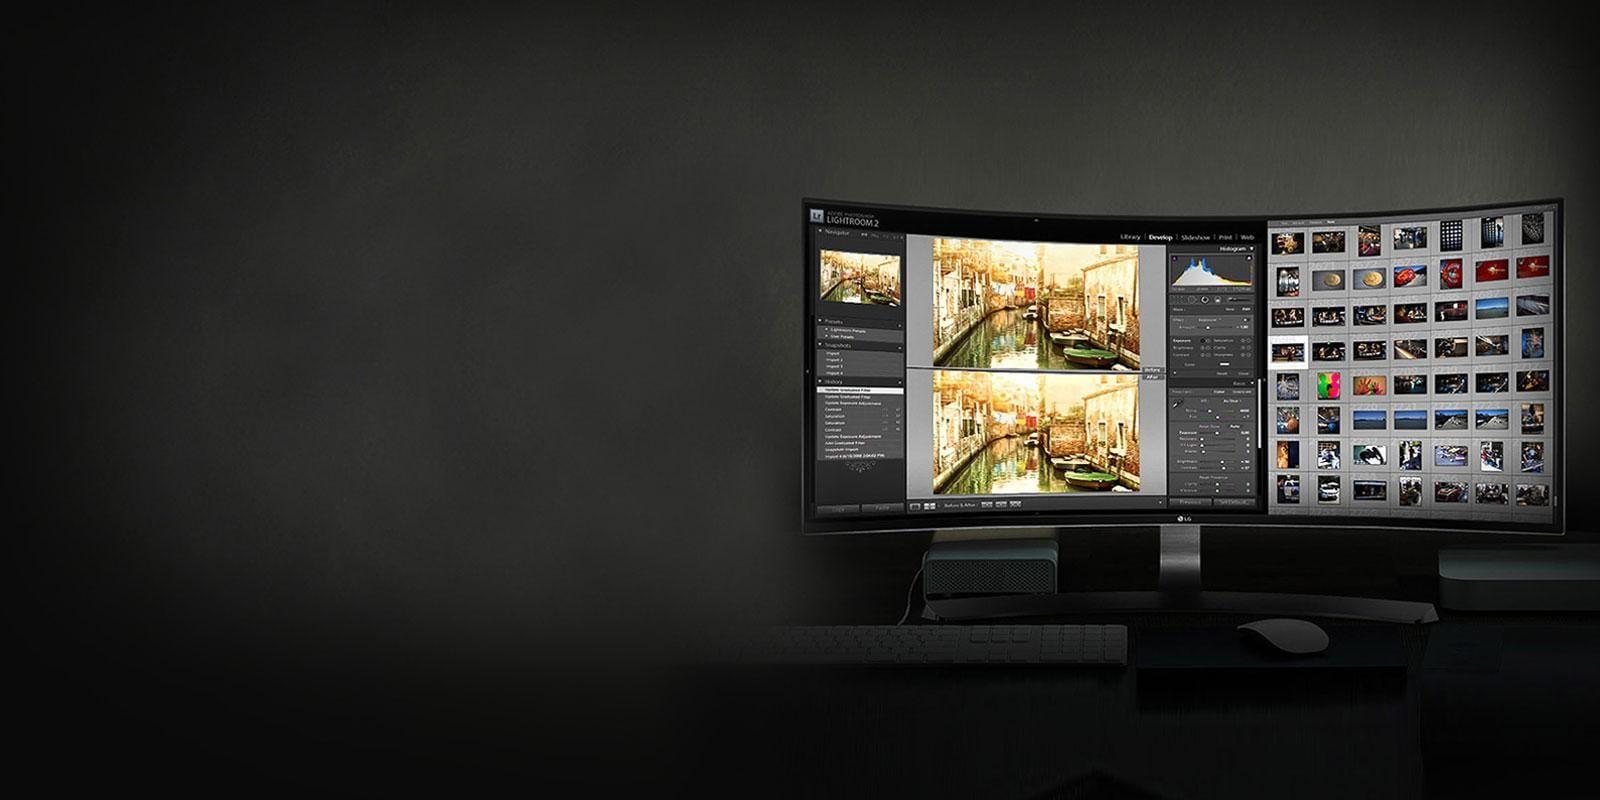 أسعار شاشات LG 32